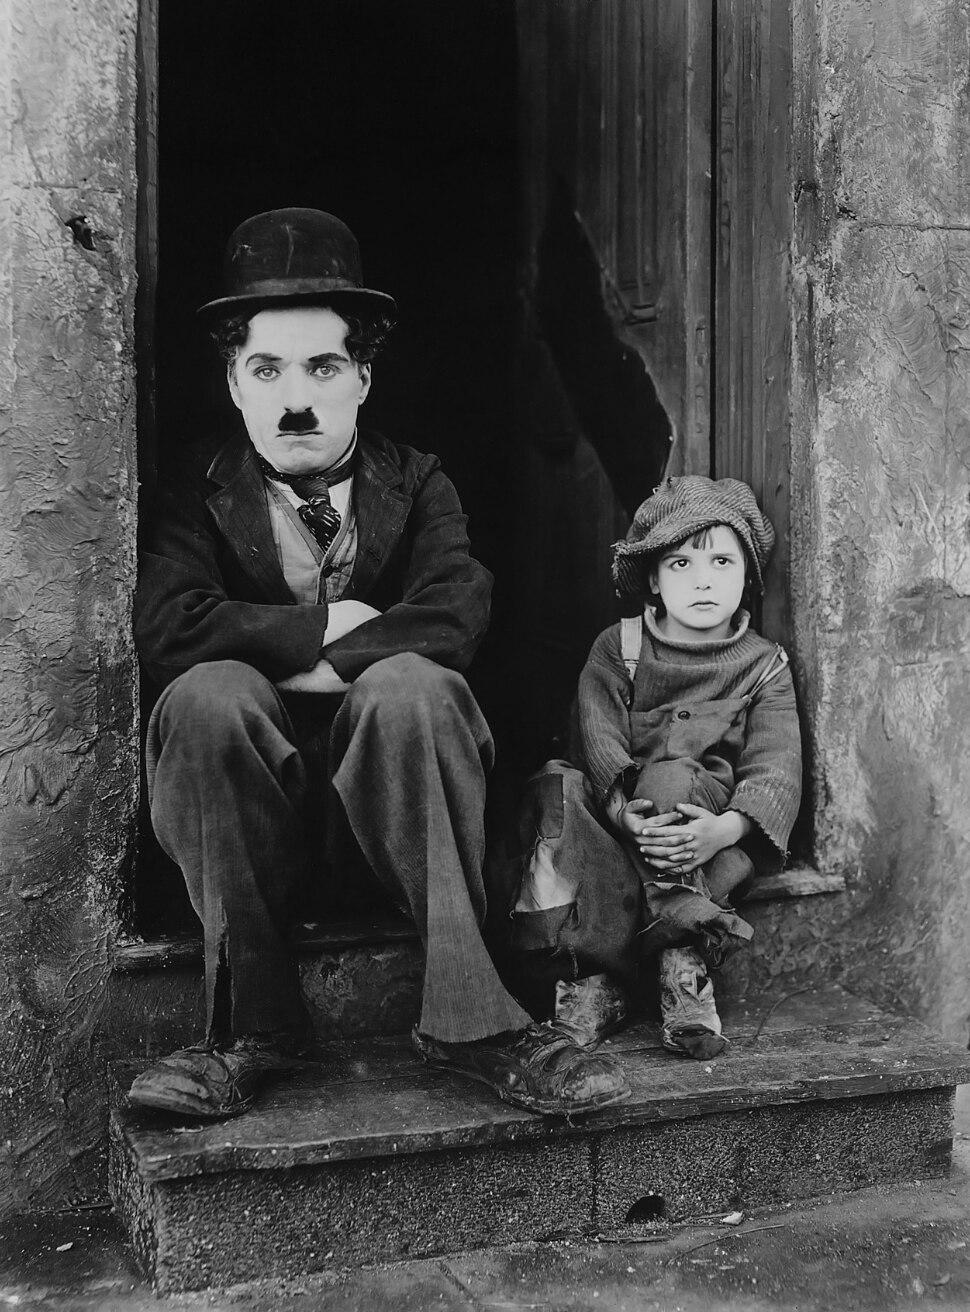 Chaplin The Kid edit